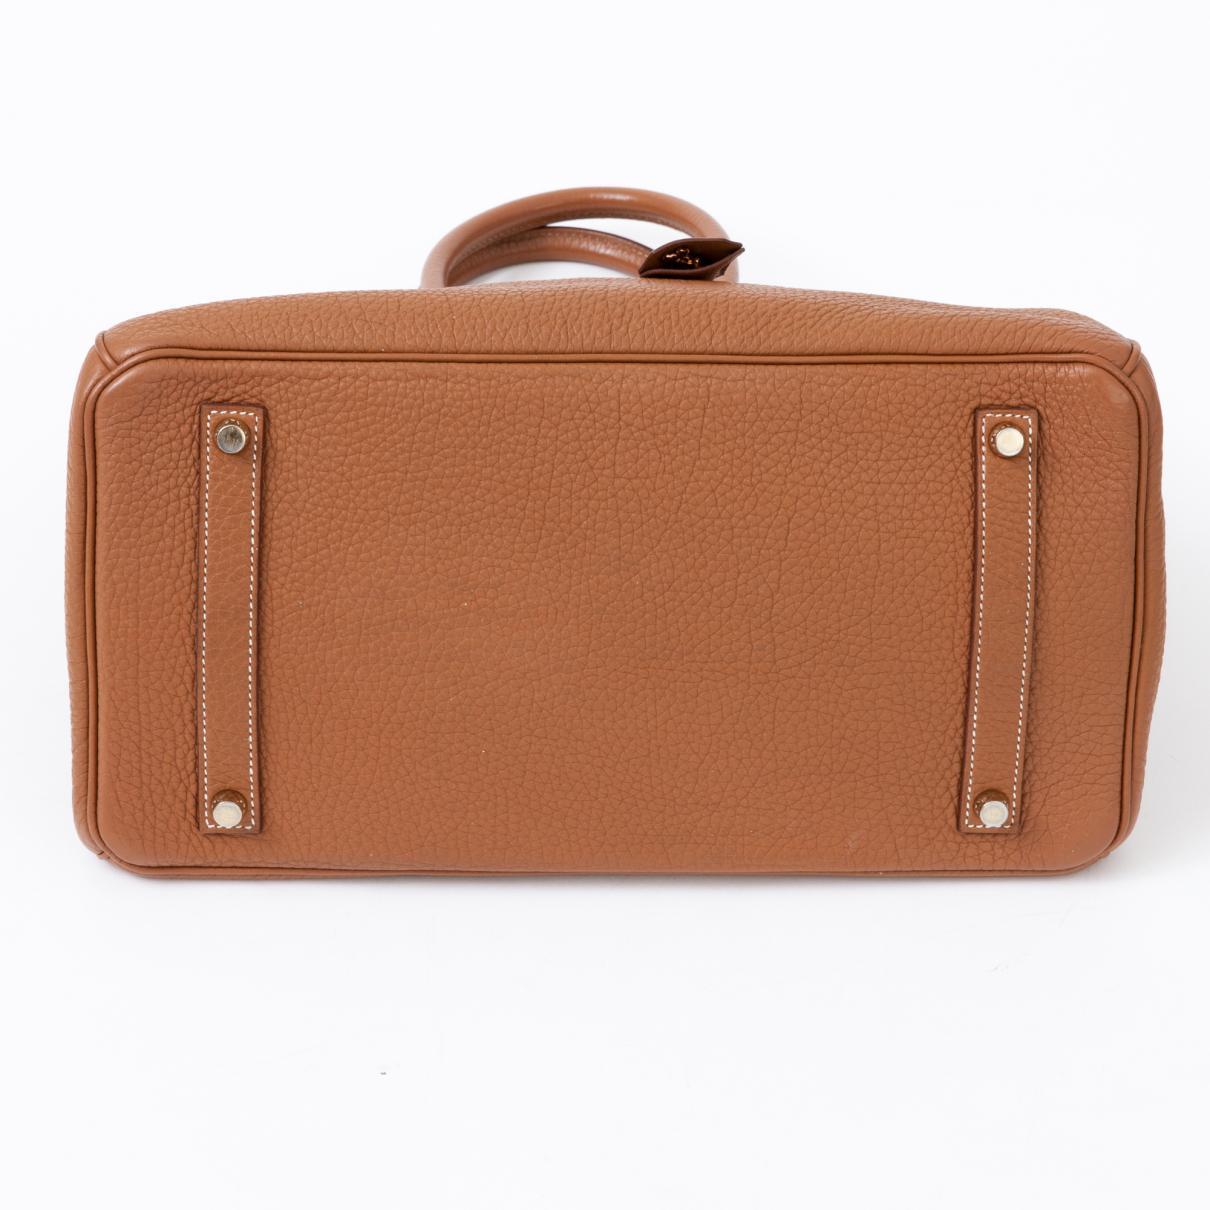 bb1a309a3d27 Lyst - Hermès Birkin 35 Leather Handbag in Brown